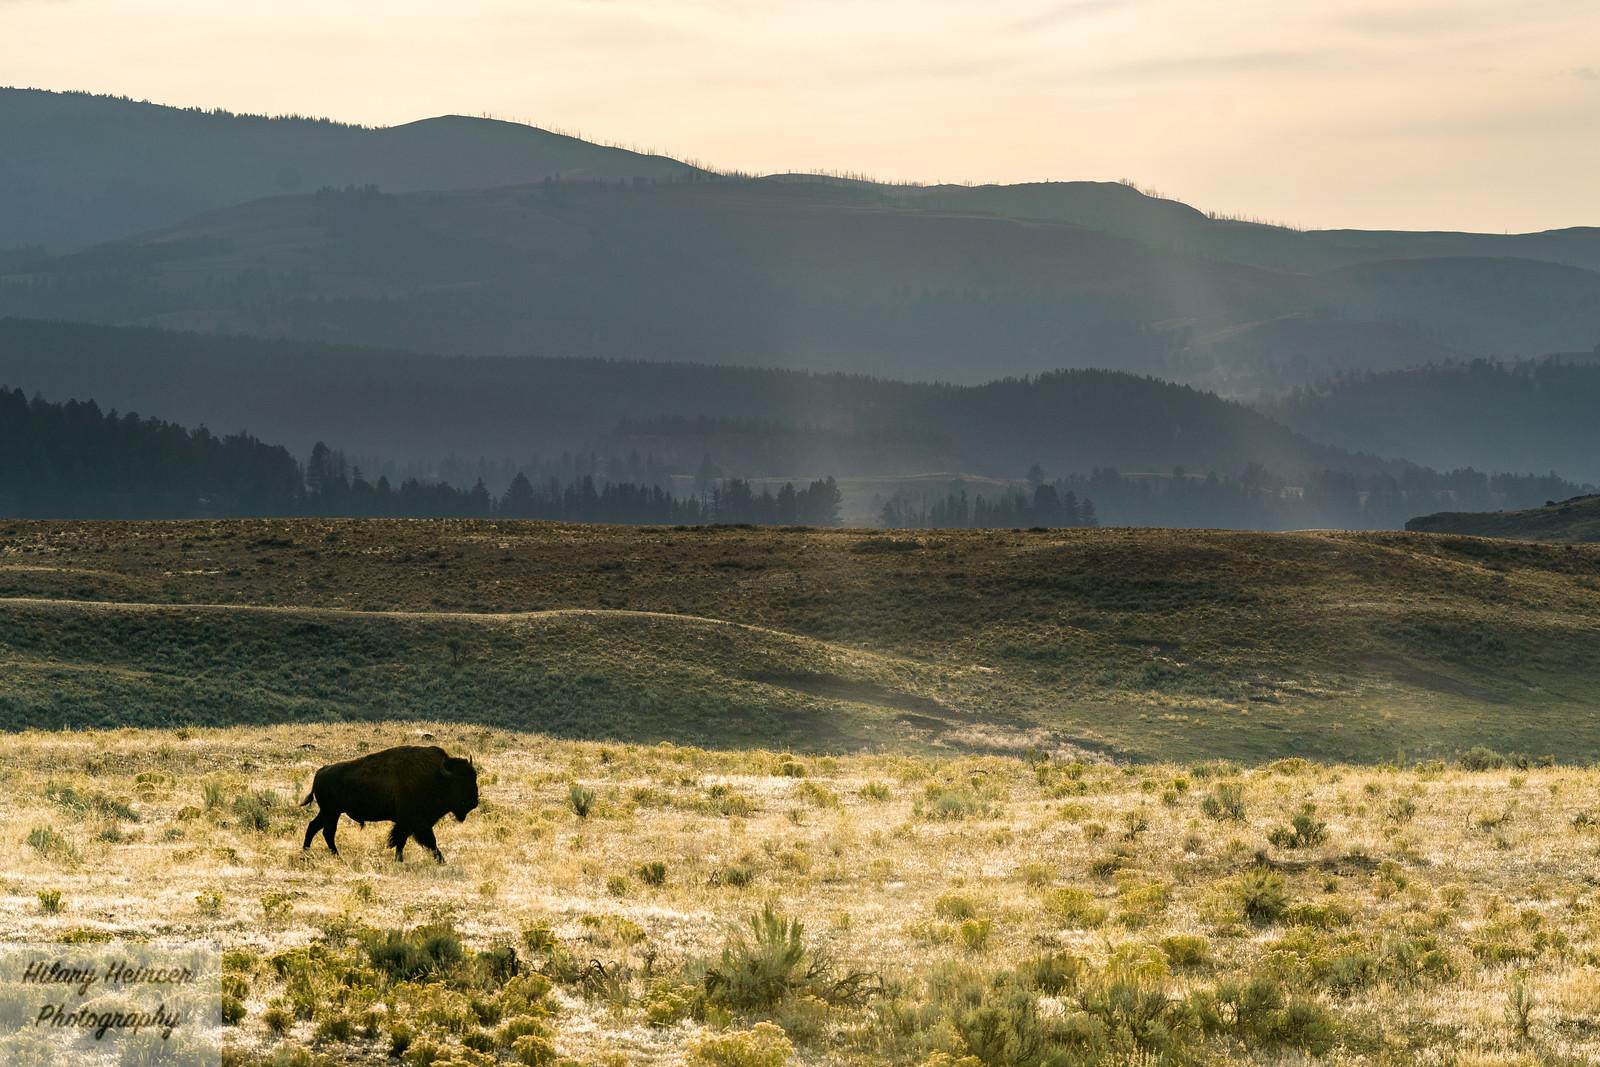 Lone Bison